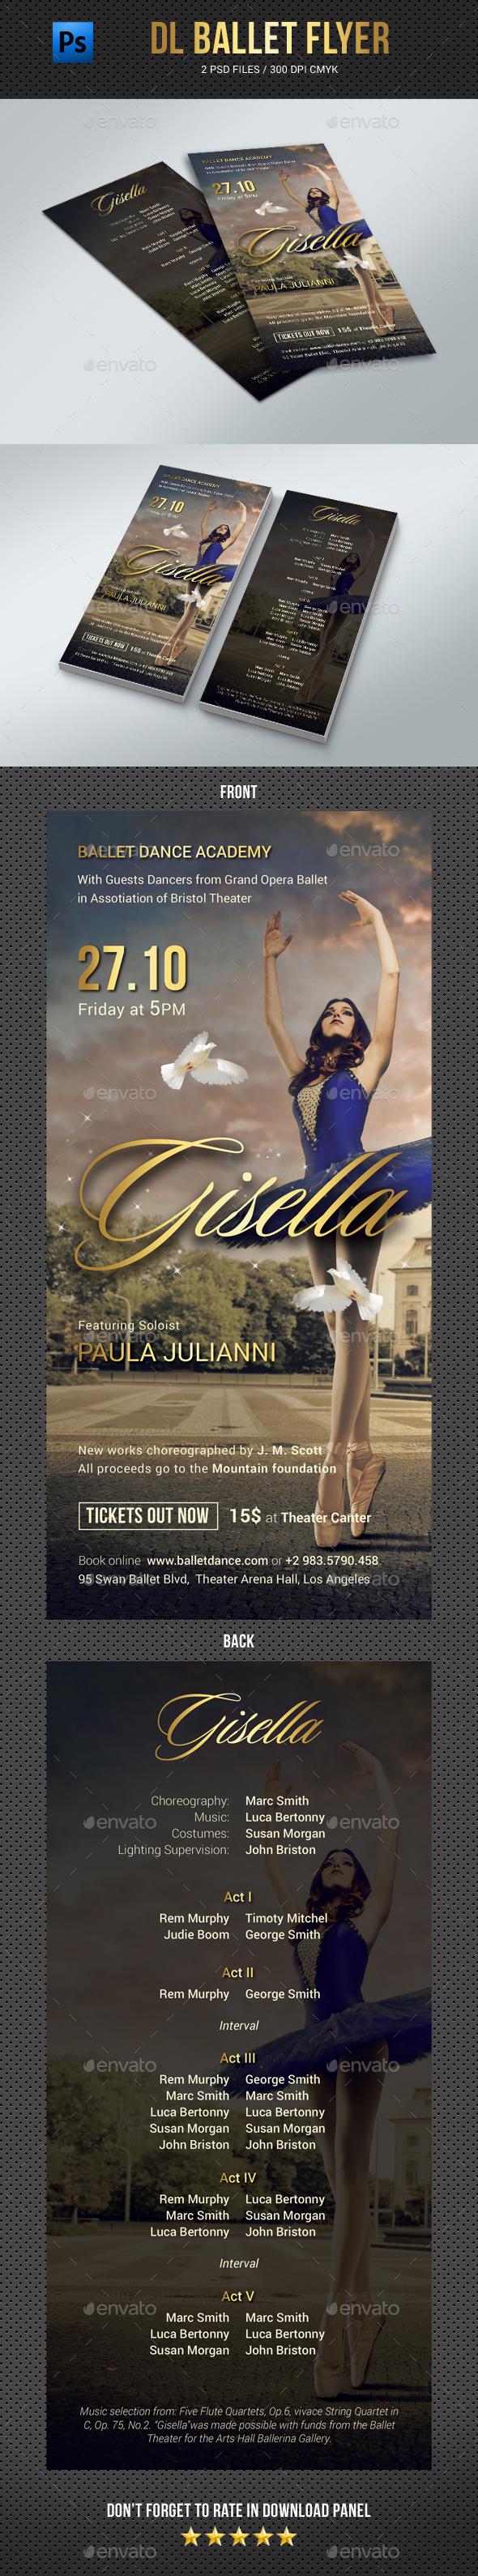 DL Ballet Flyer - Events Flyers